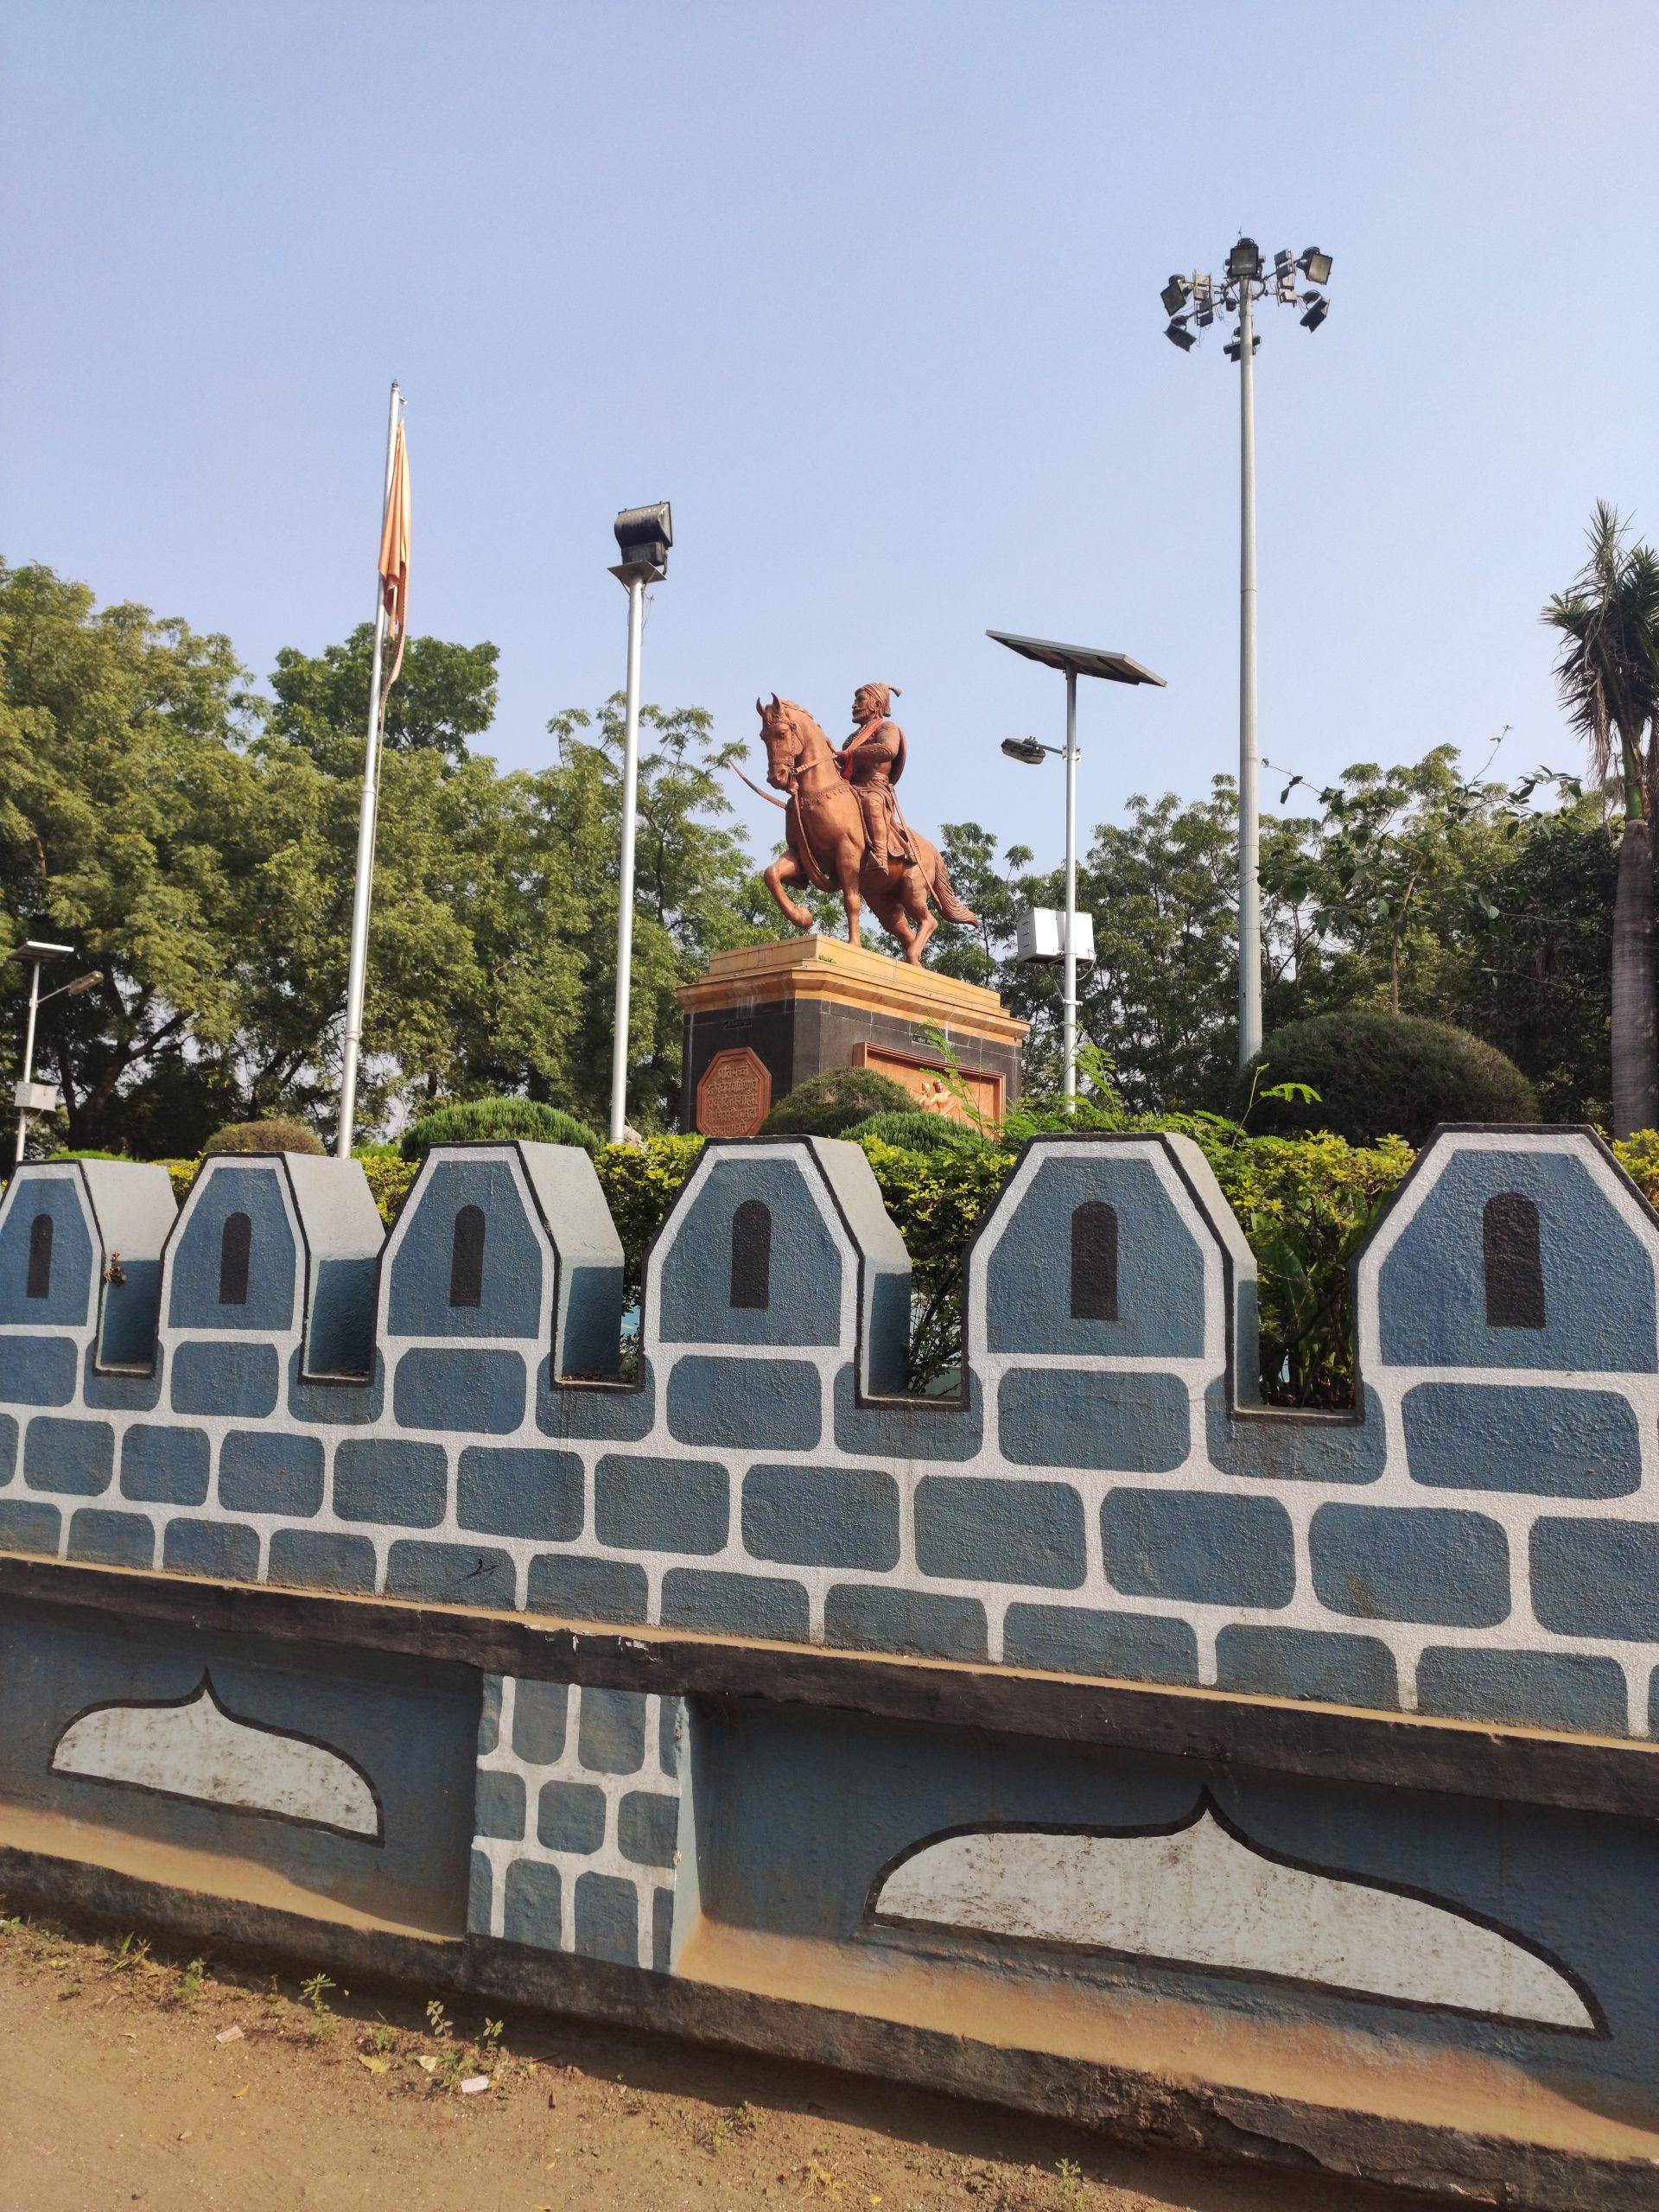 A statue of Shivaji Maharaj